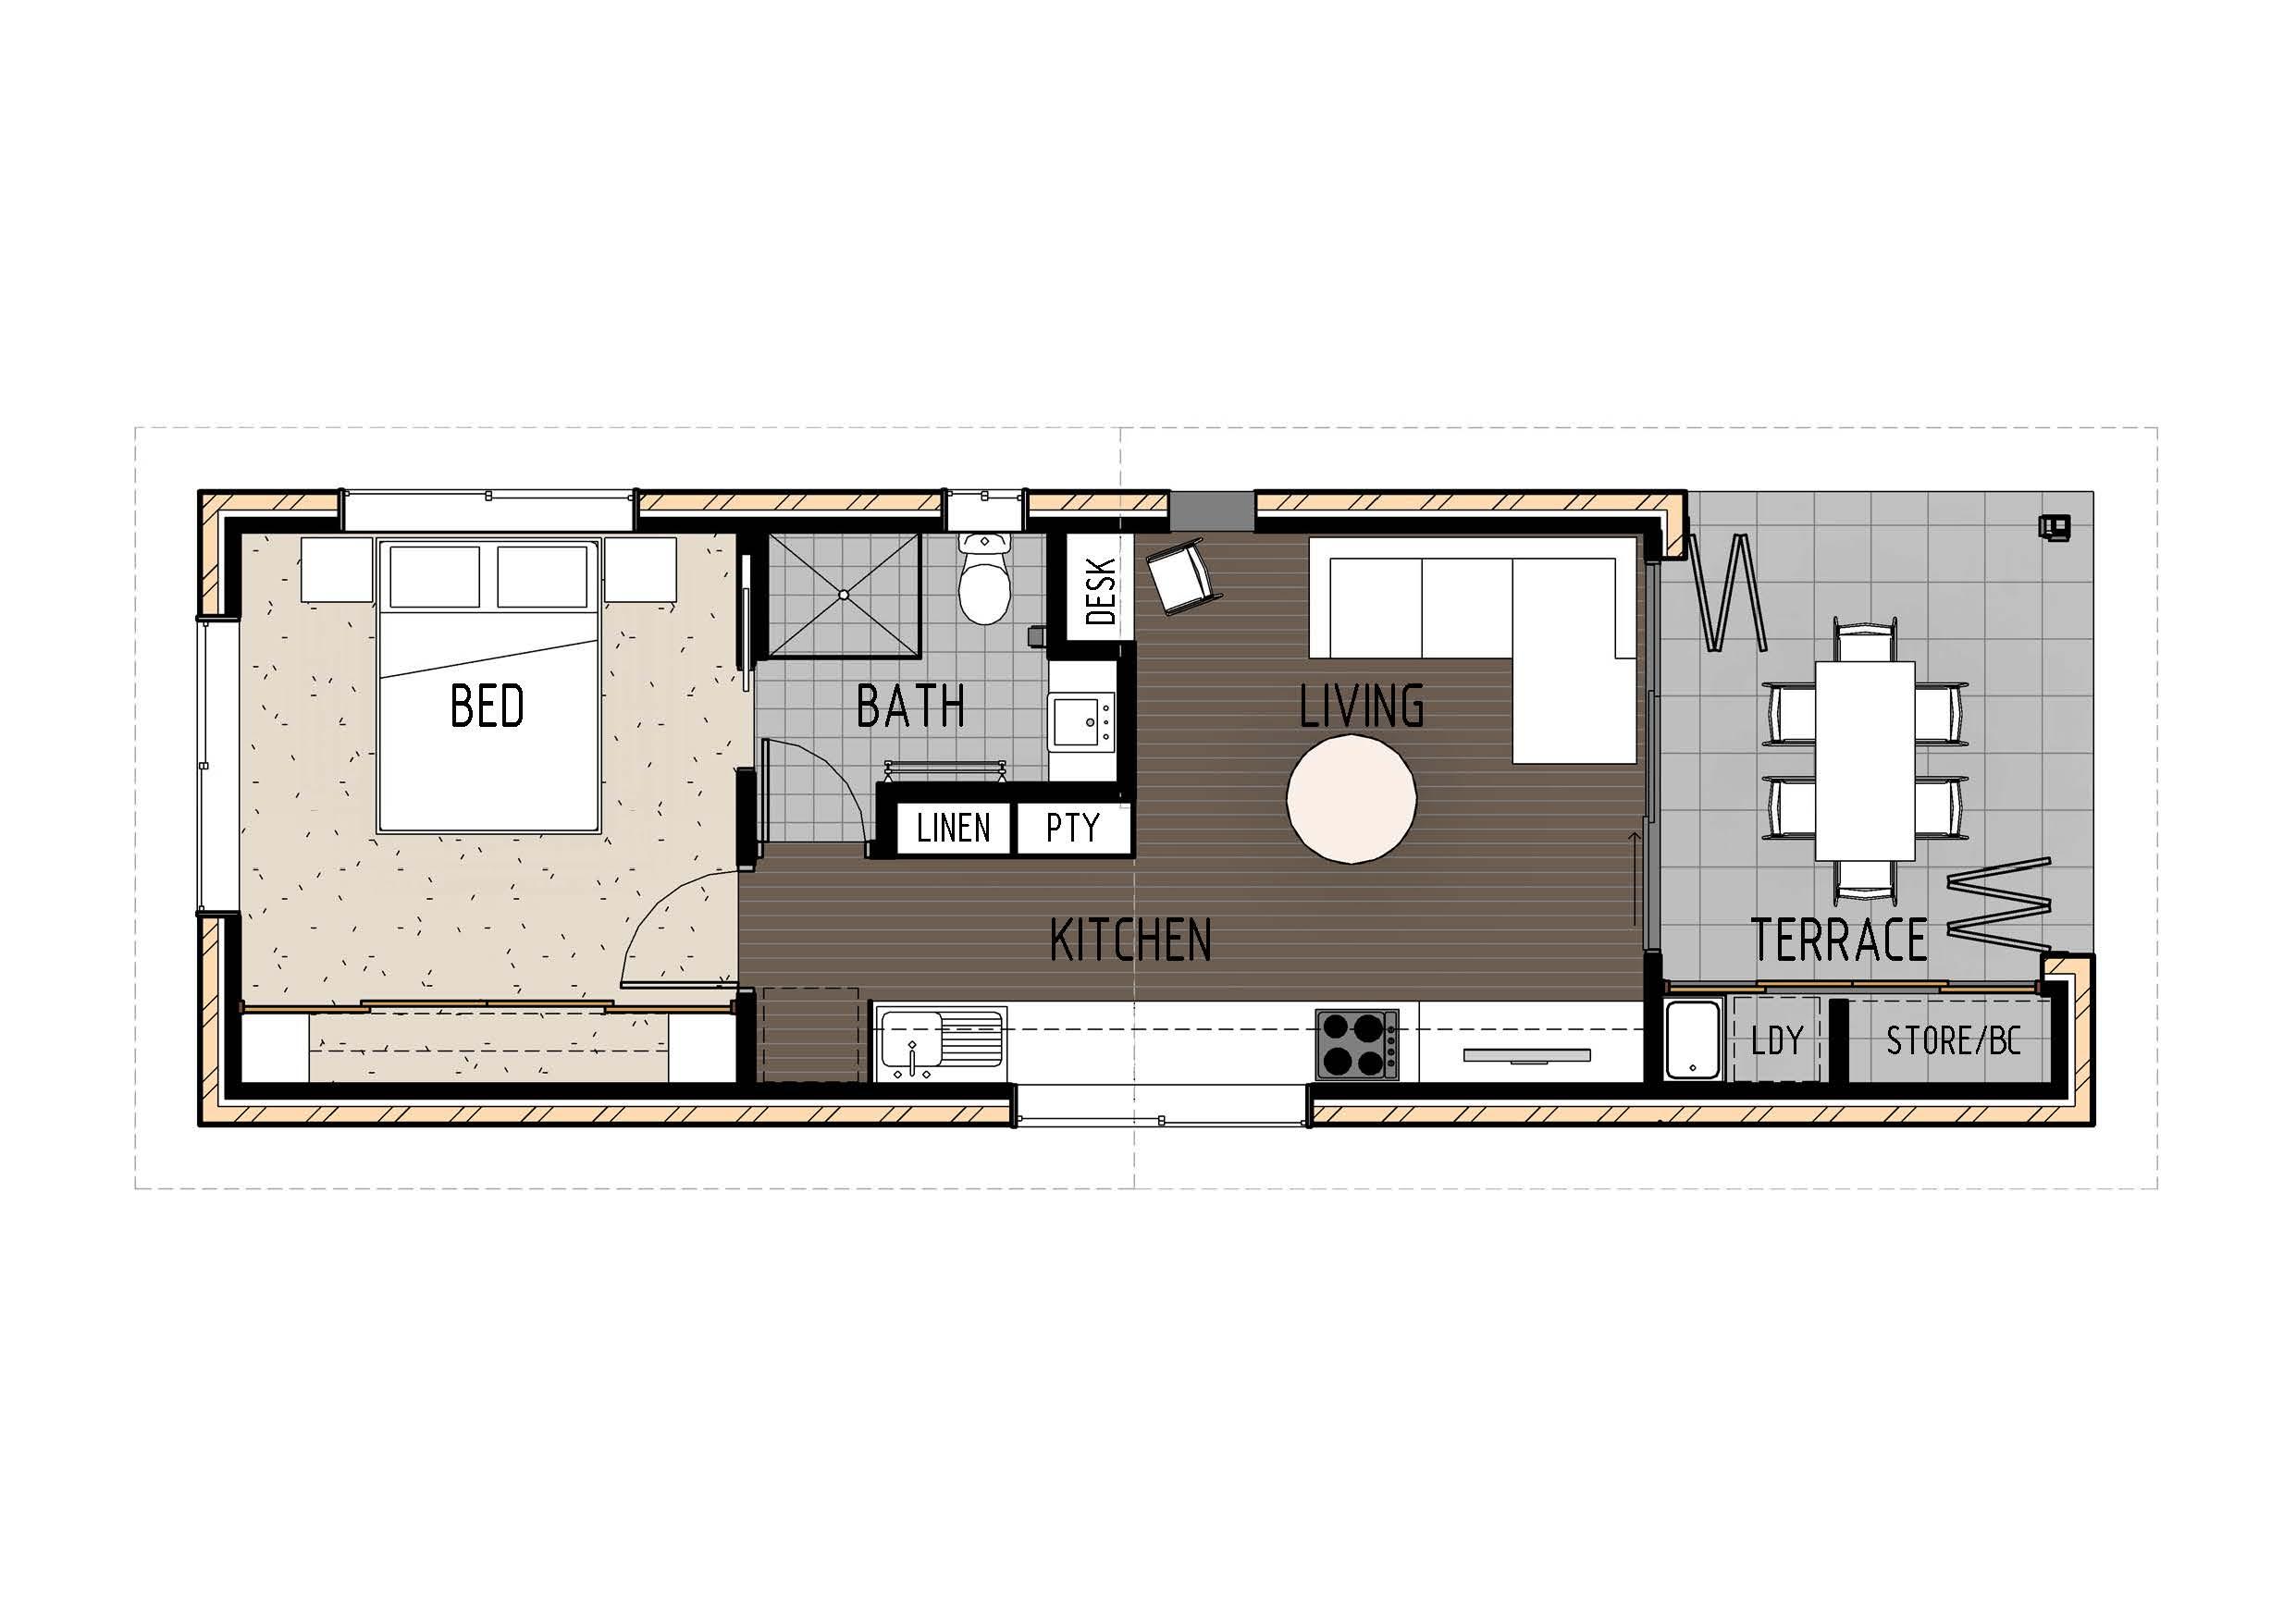 GF1009 floor plan.JPG